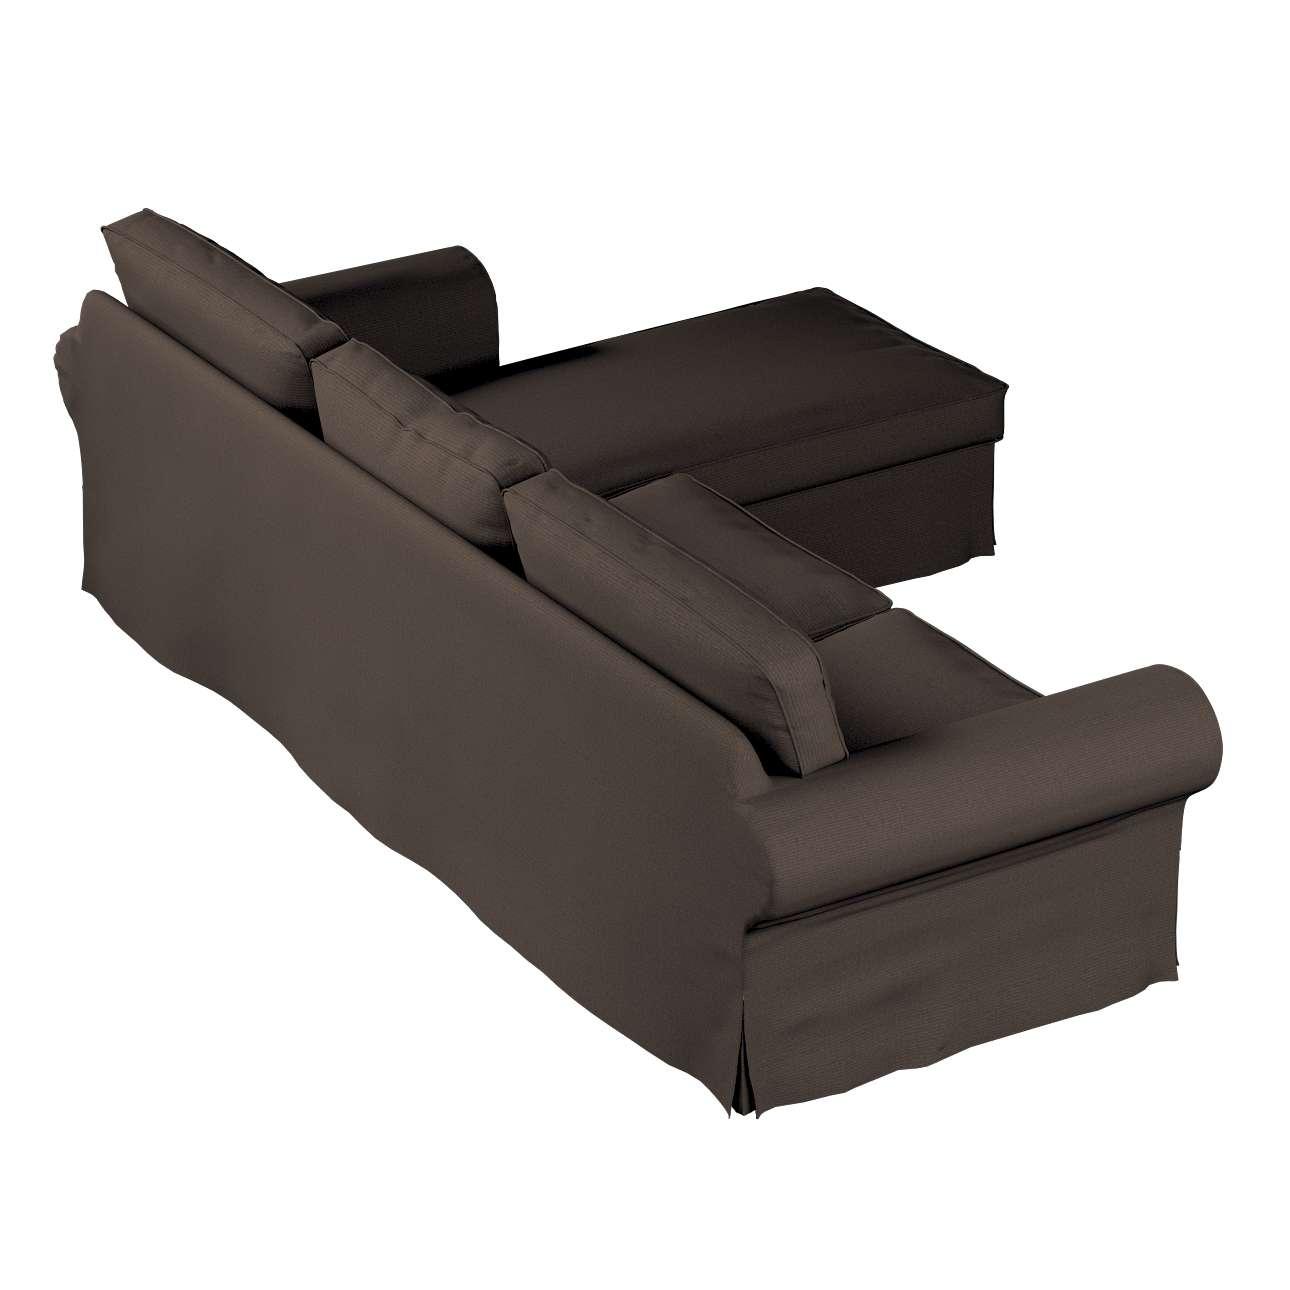 Ektorp 2-Sitzer Sofabezug mit Recamiere Ektorp 2-Sitzer Sofabezug mit Recamiere von der Kollektion Etna, Stoff: 705-08